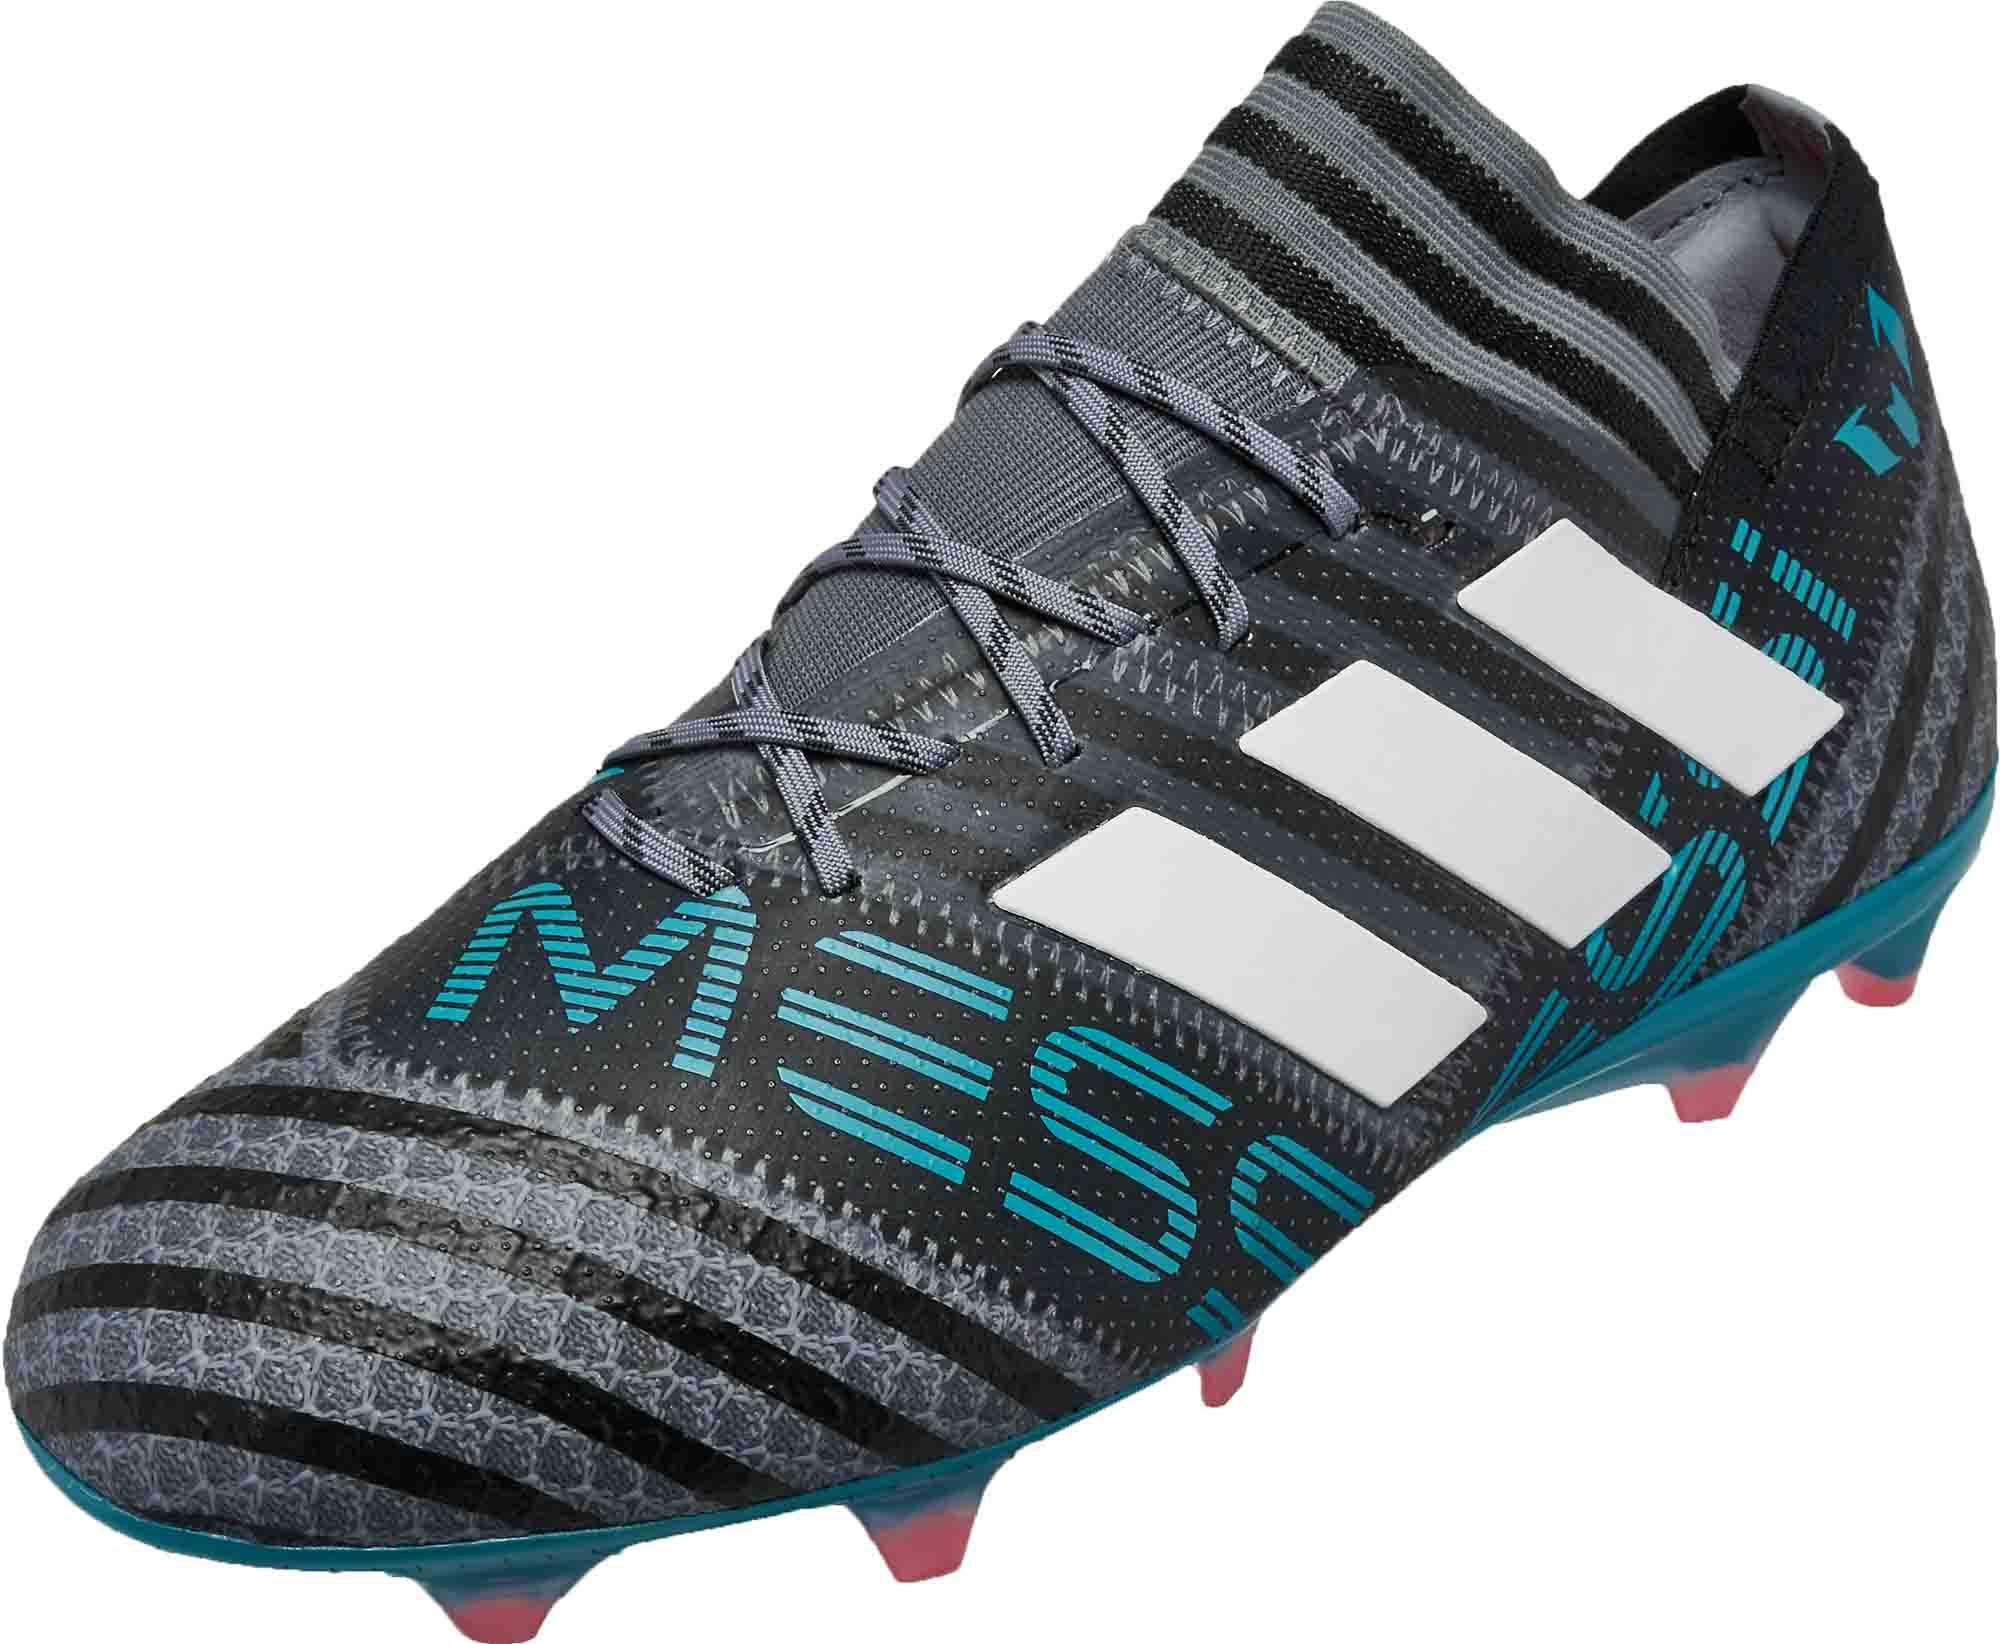 d9c2ab817 adidas Messi Nemeziz 17.1 - Grey and White